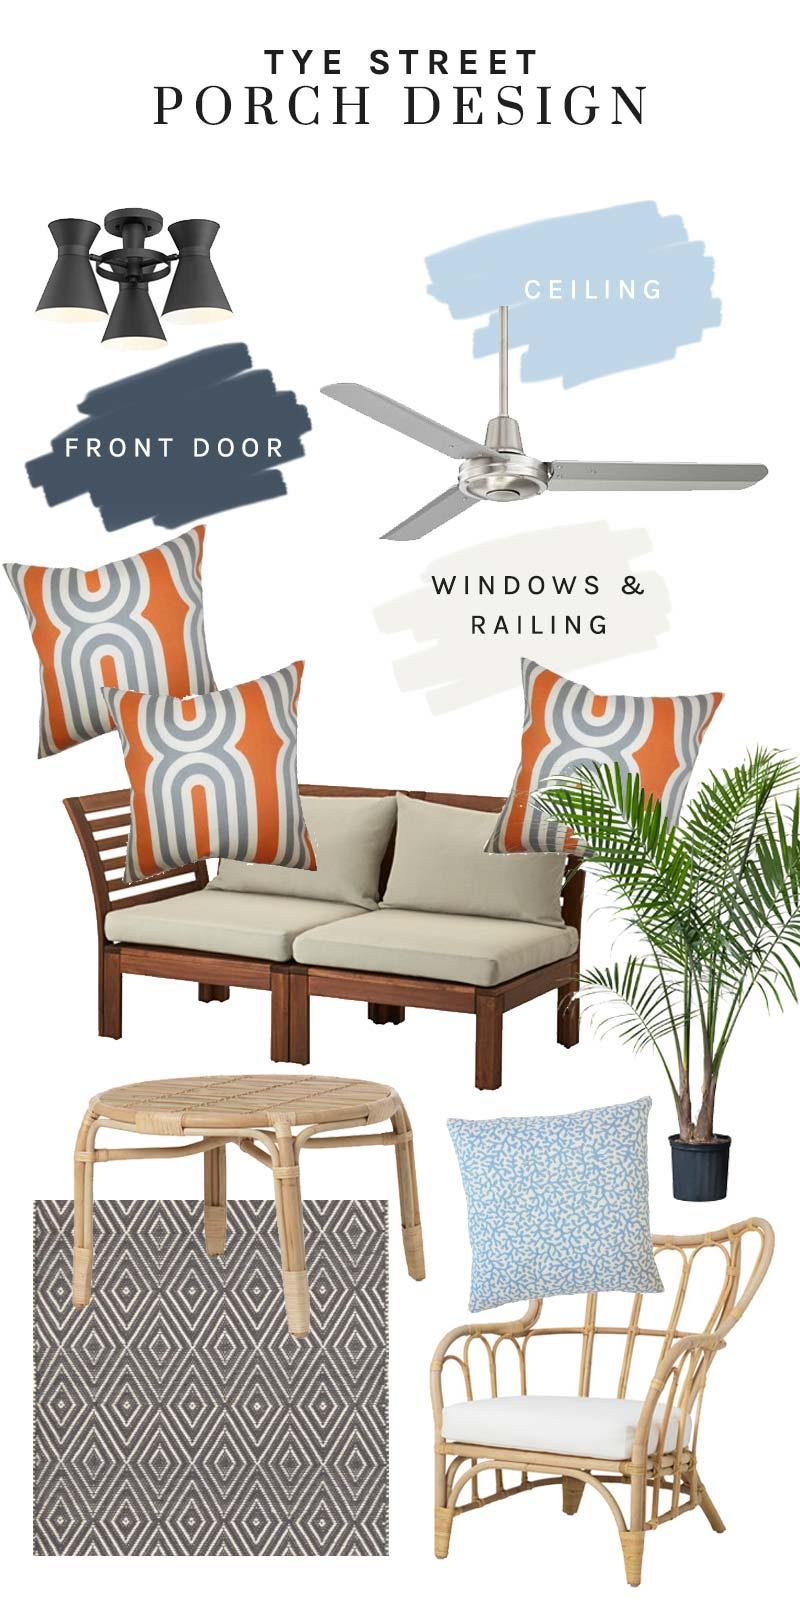 Tye Street porch design plans on Thou Swell @thouswellblog